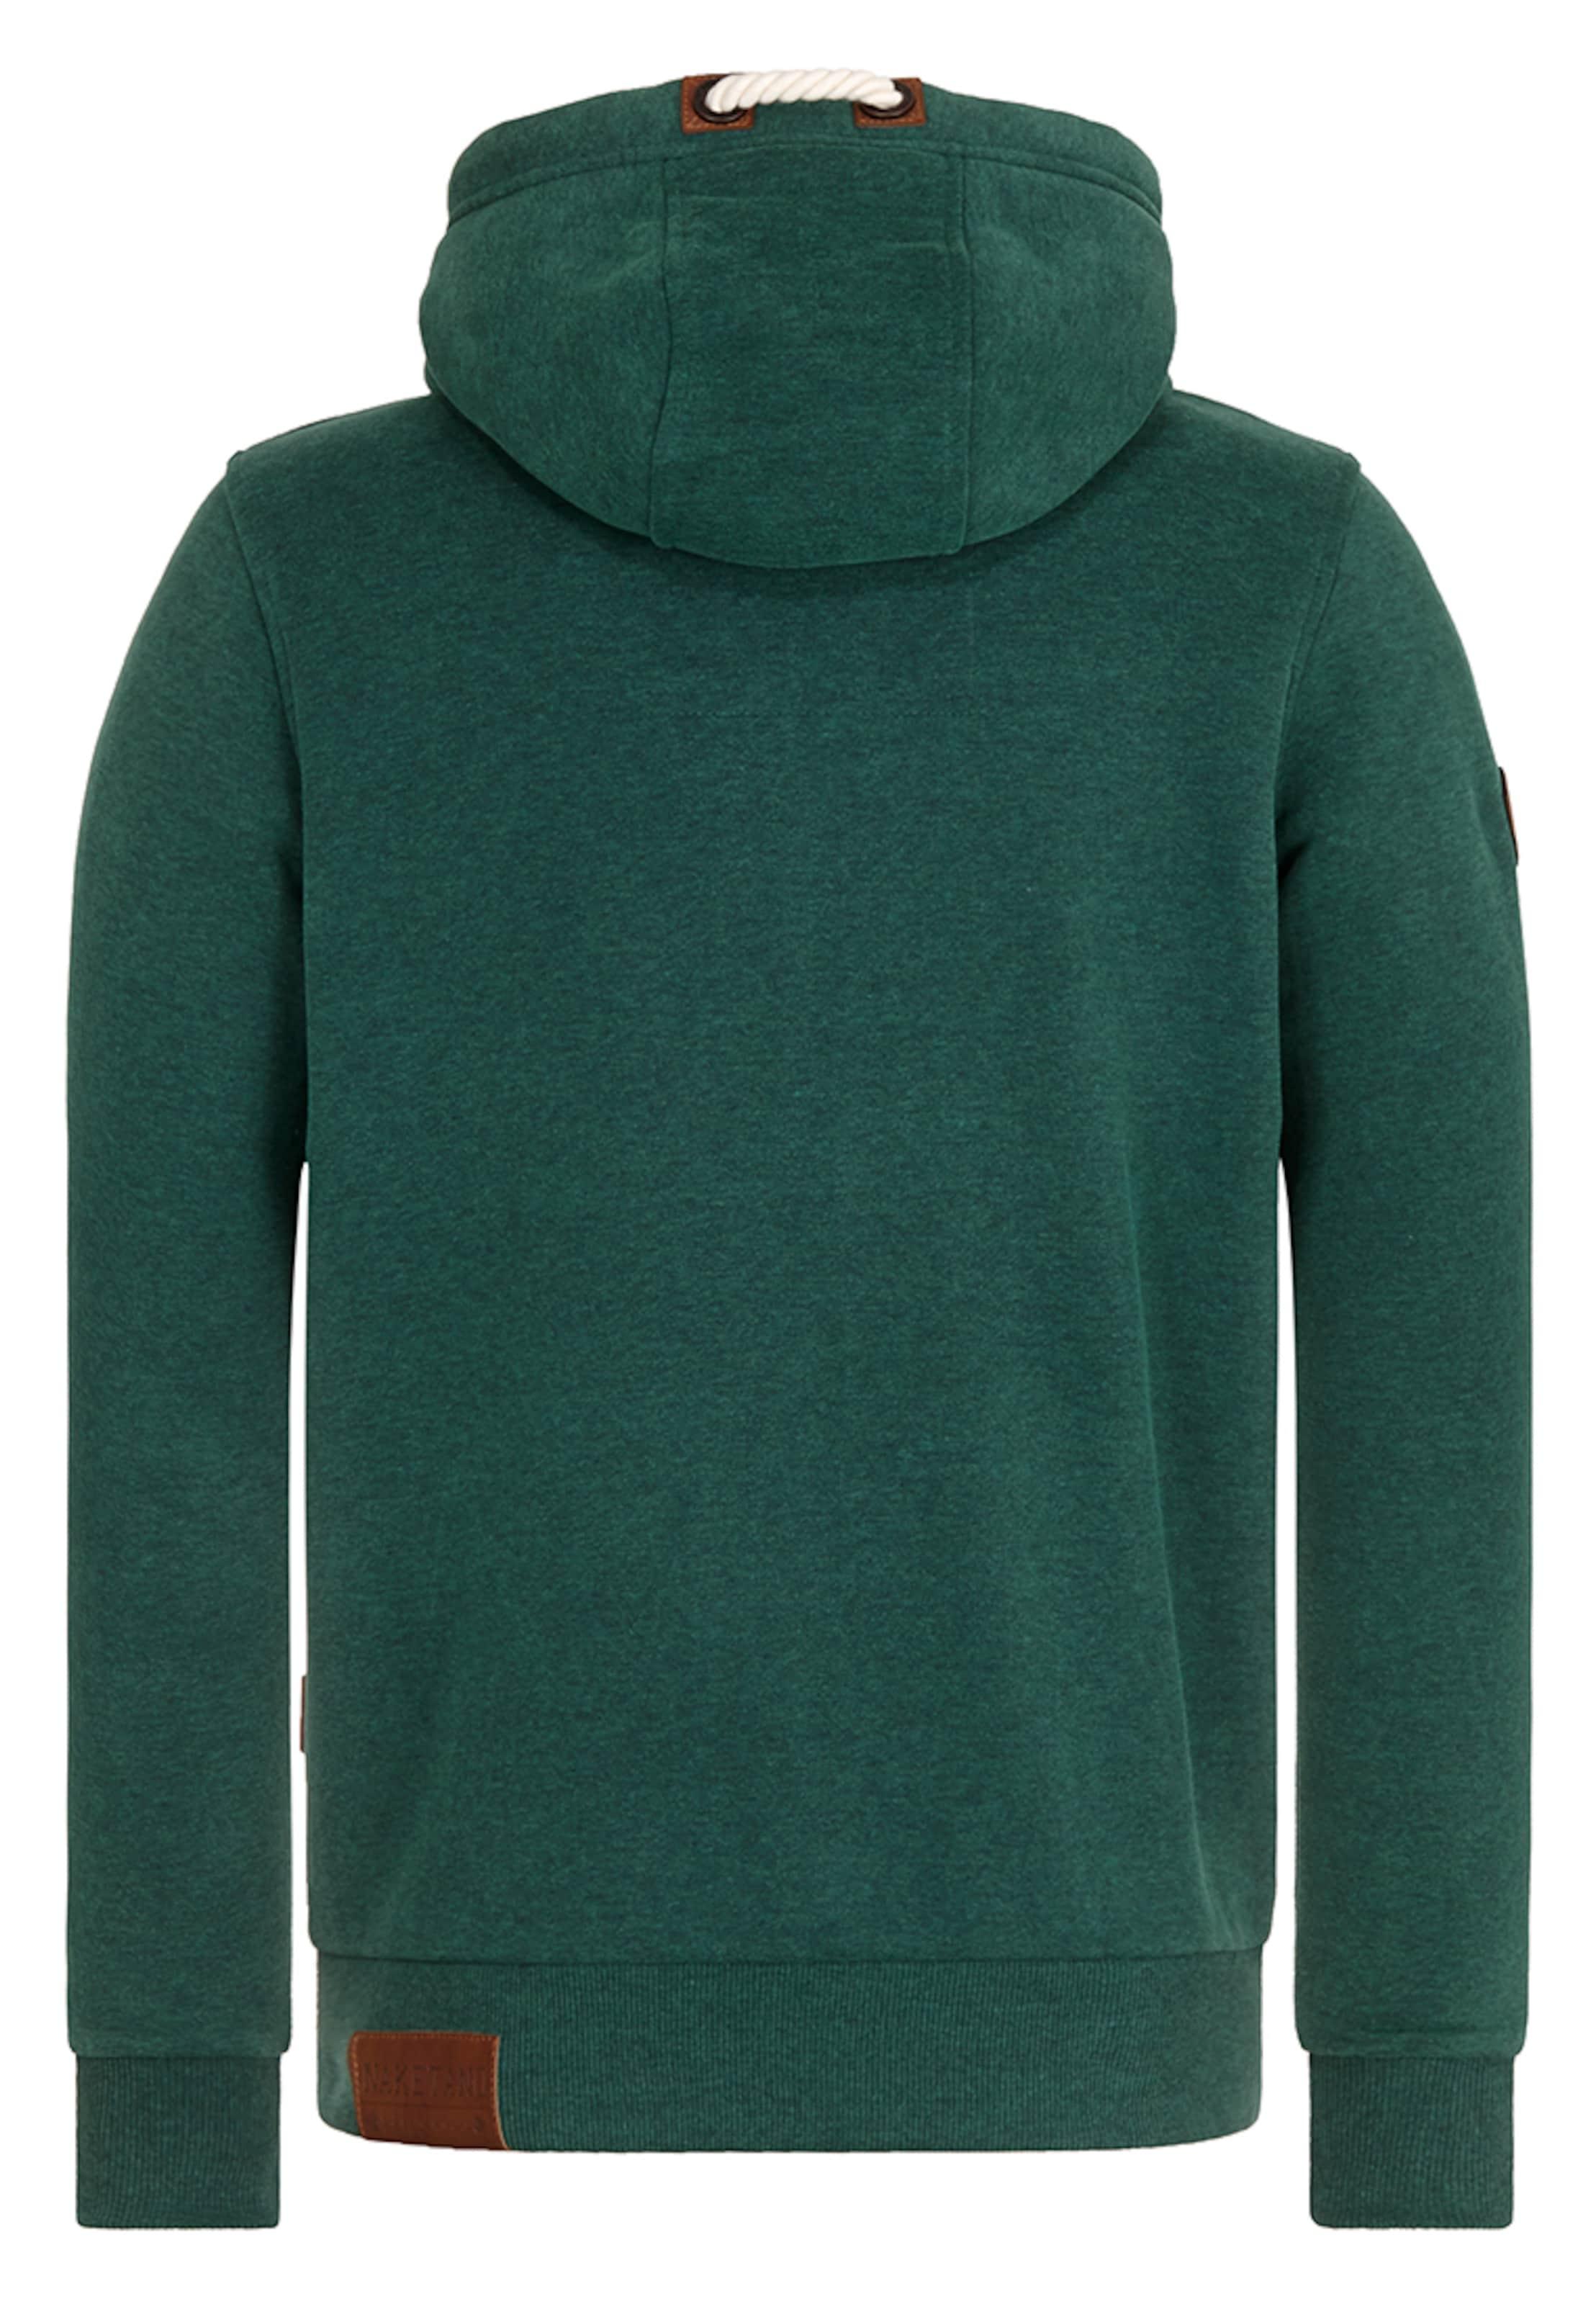 naketano Male Zipped Jacket Günstig Kaufen Amazon Rabatt Offizielle Seite 8SF07ddyYS